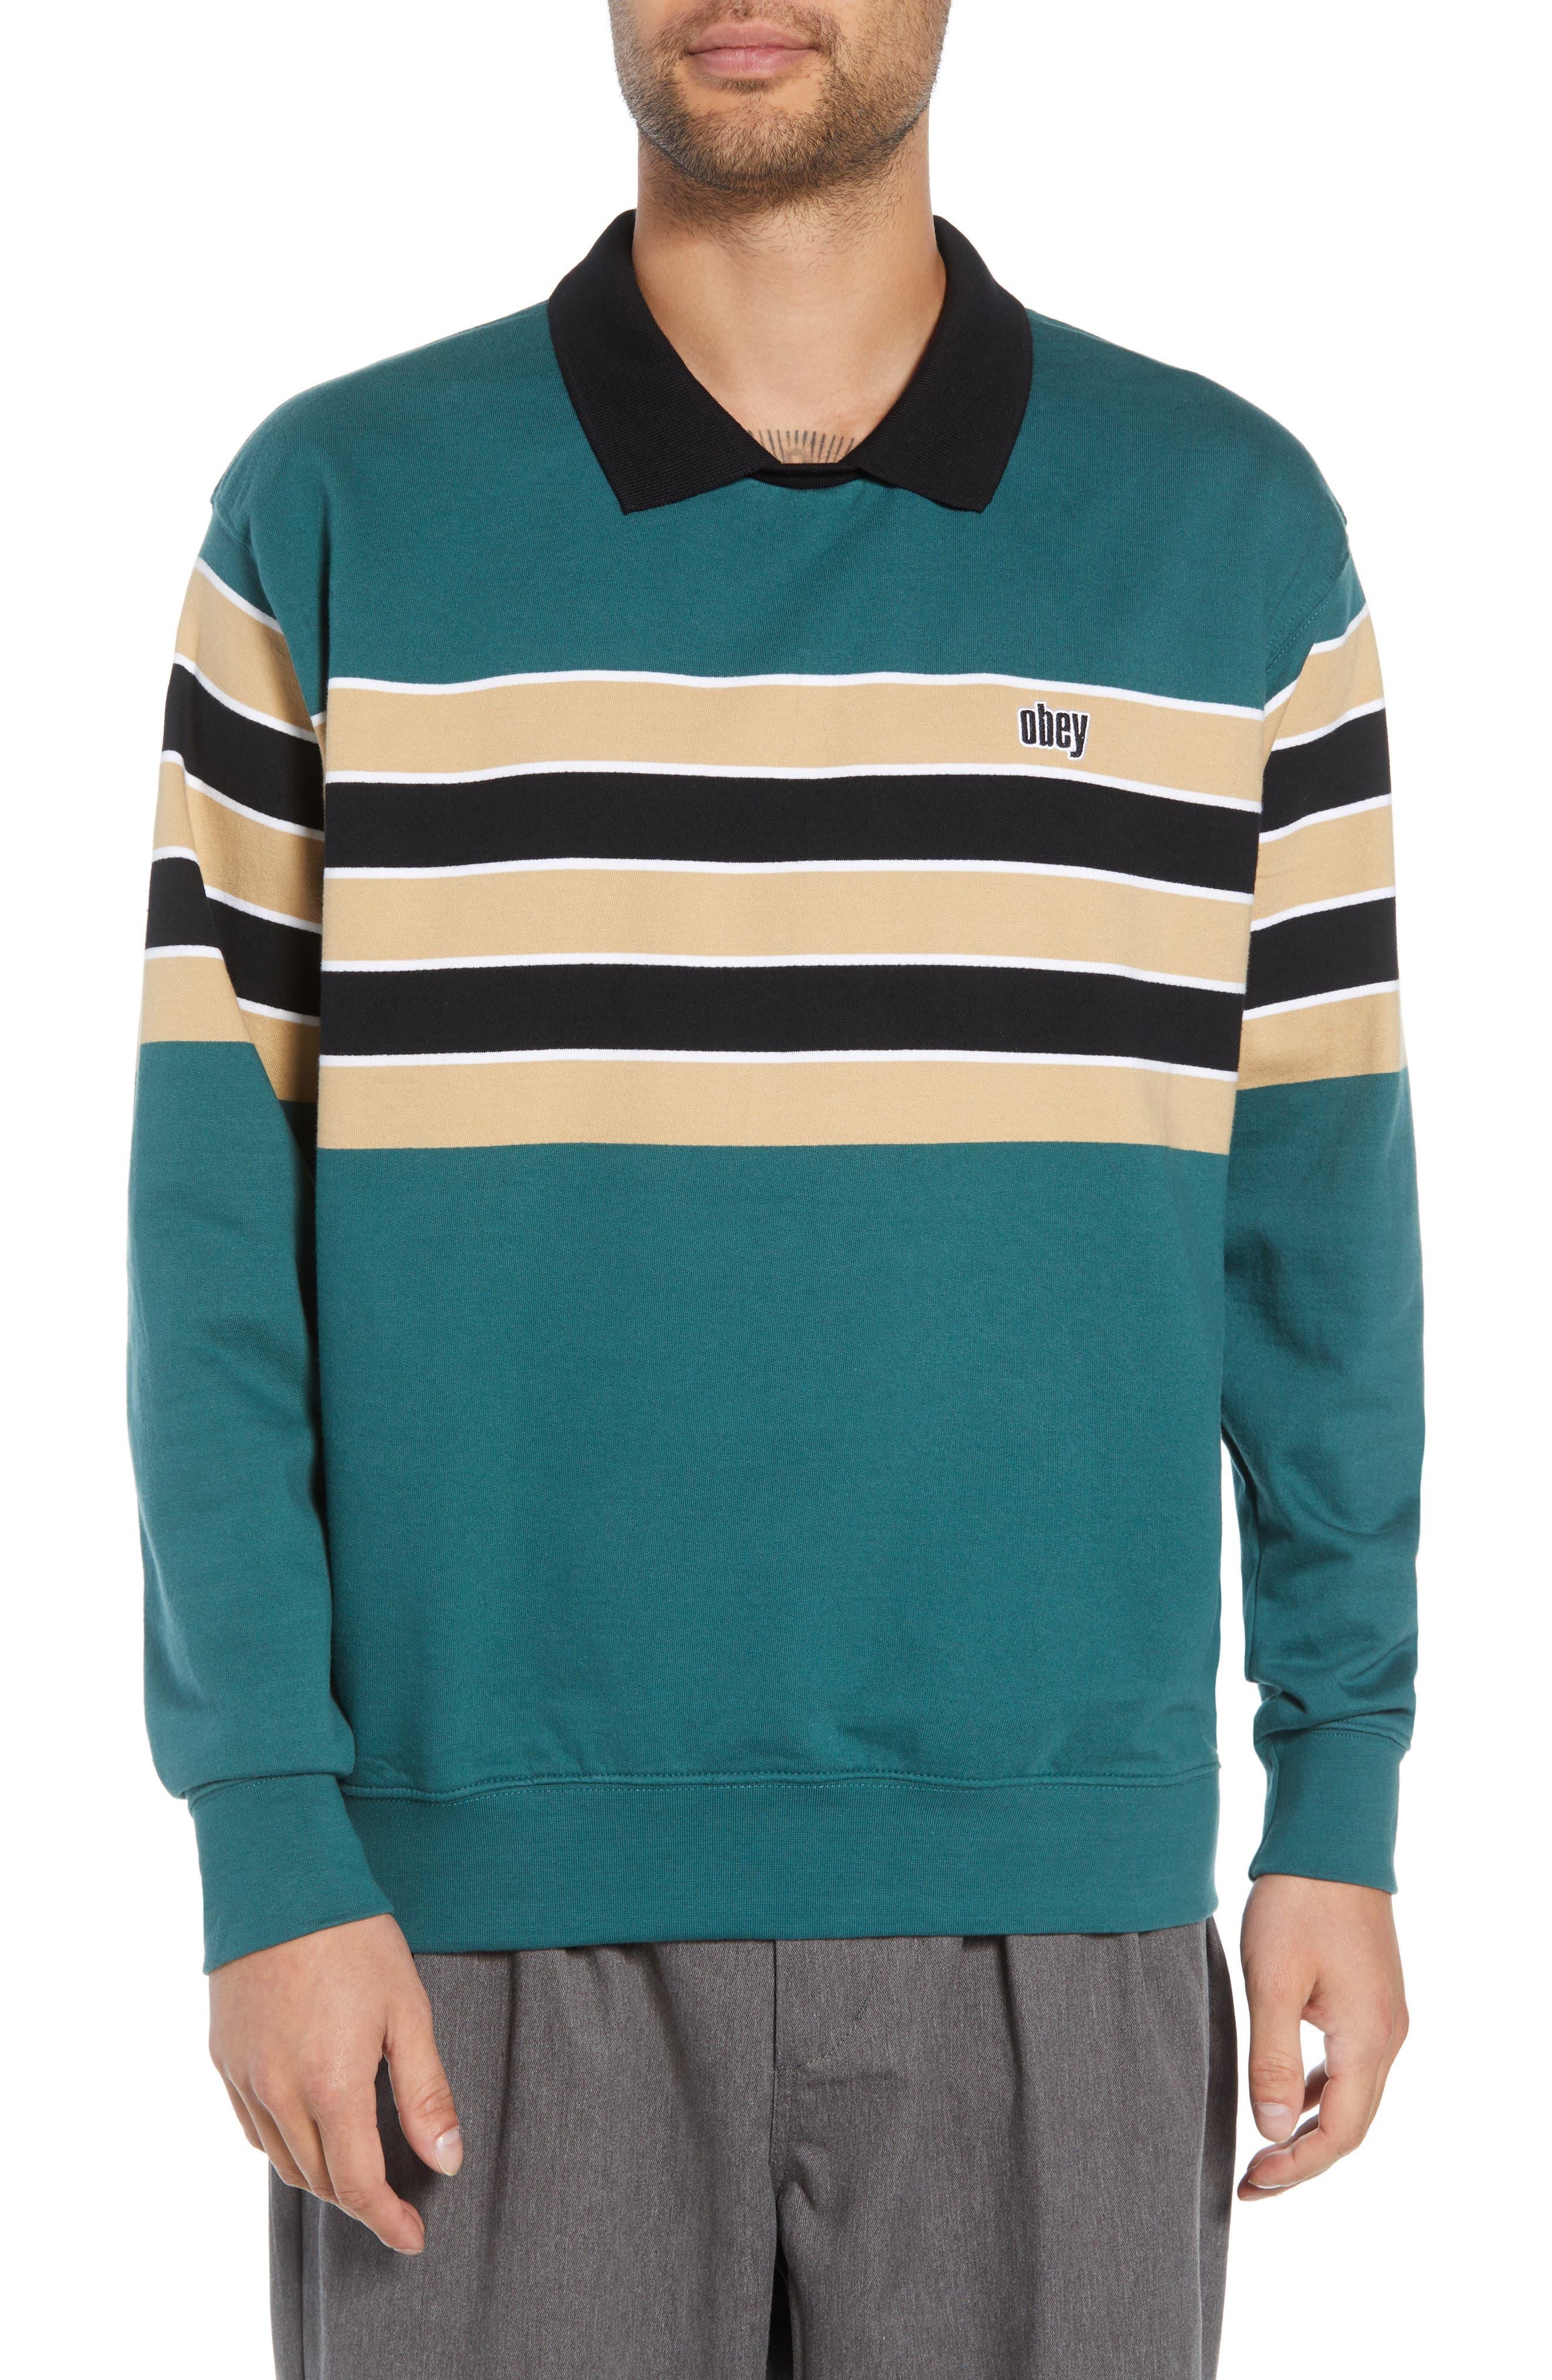 Cupid Striped Polo Collar Sweatshirt,                         Main,                         color, DARK TEAL MULTI